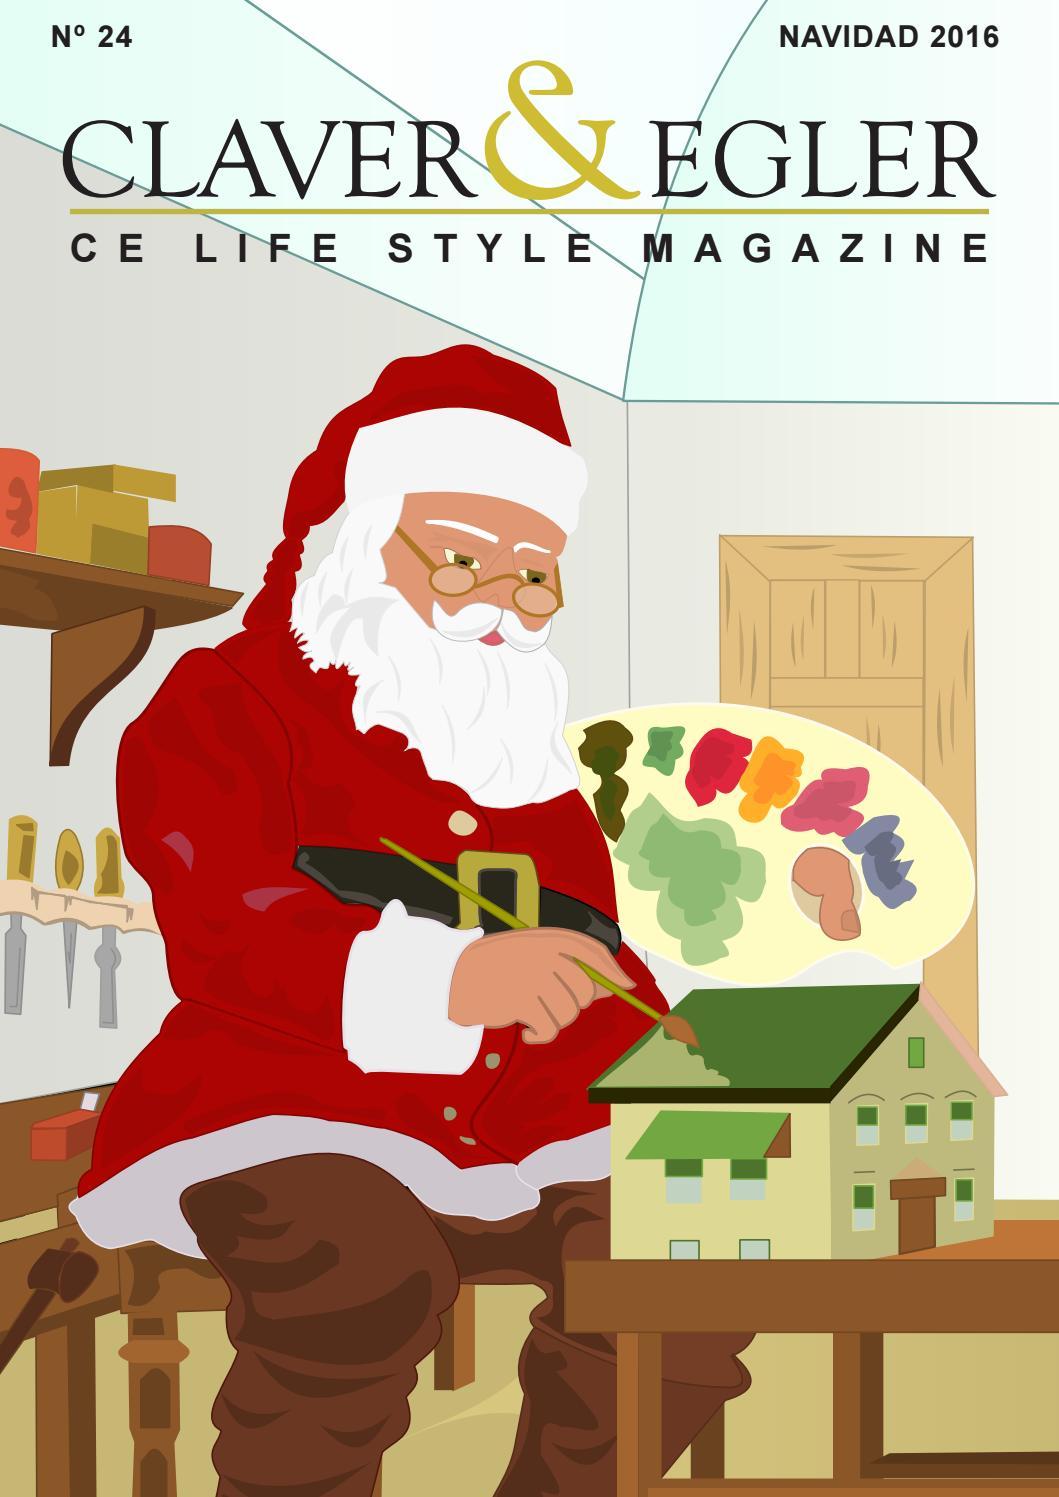 Claver&Egler Especial Navidad 2016 nº 24 by CLAVER & EGLER LIFE ...